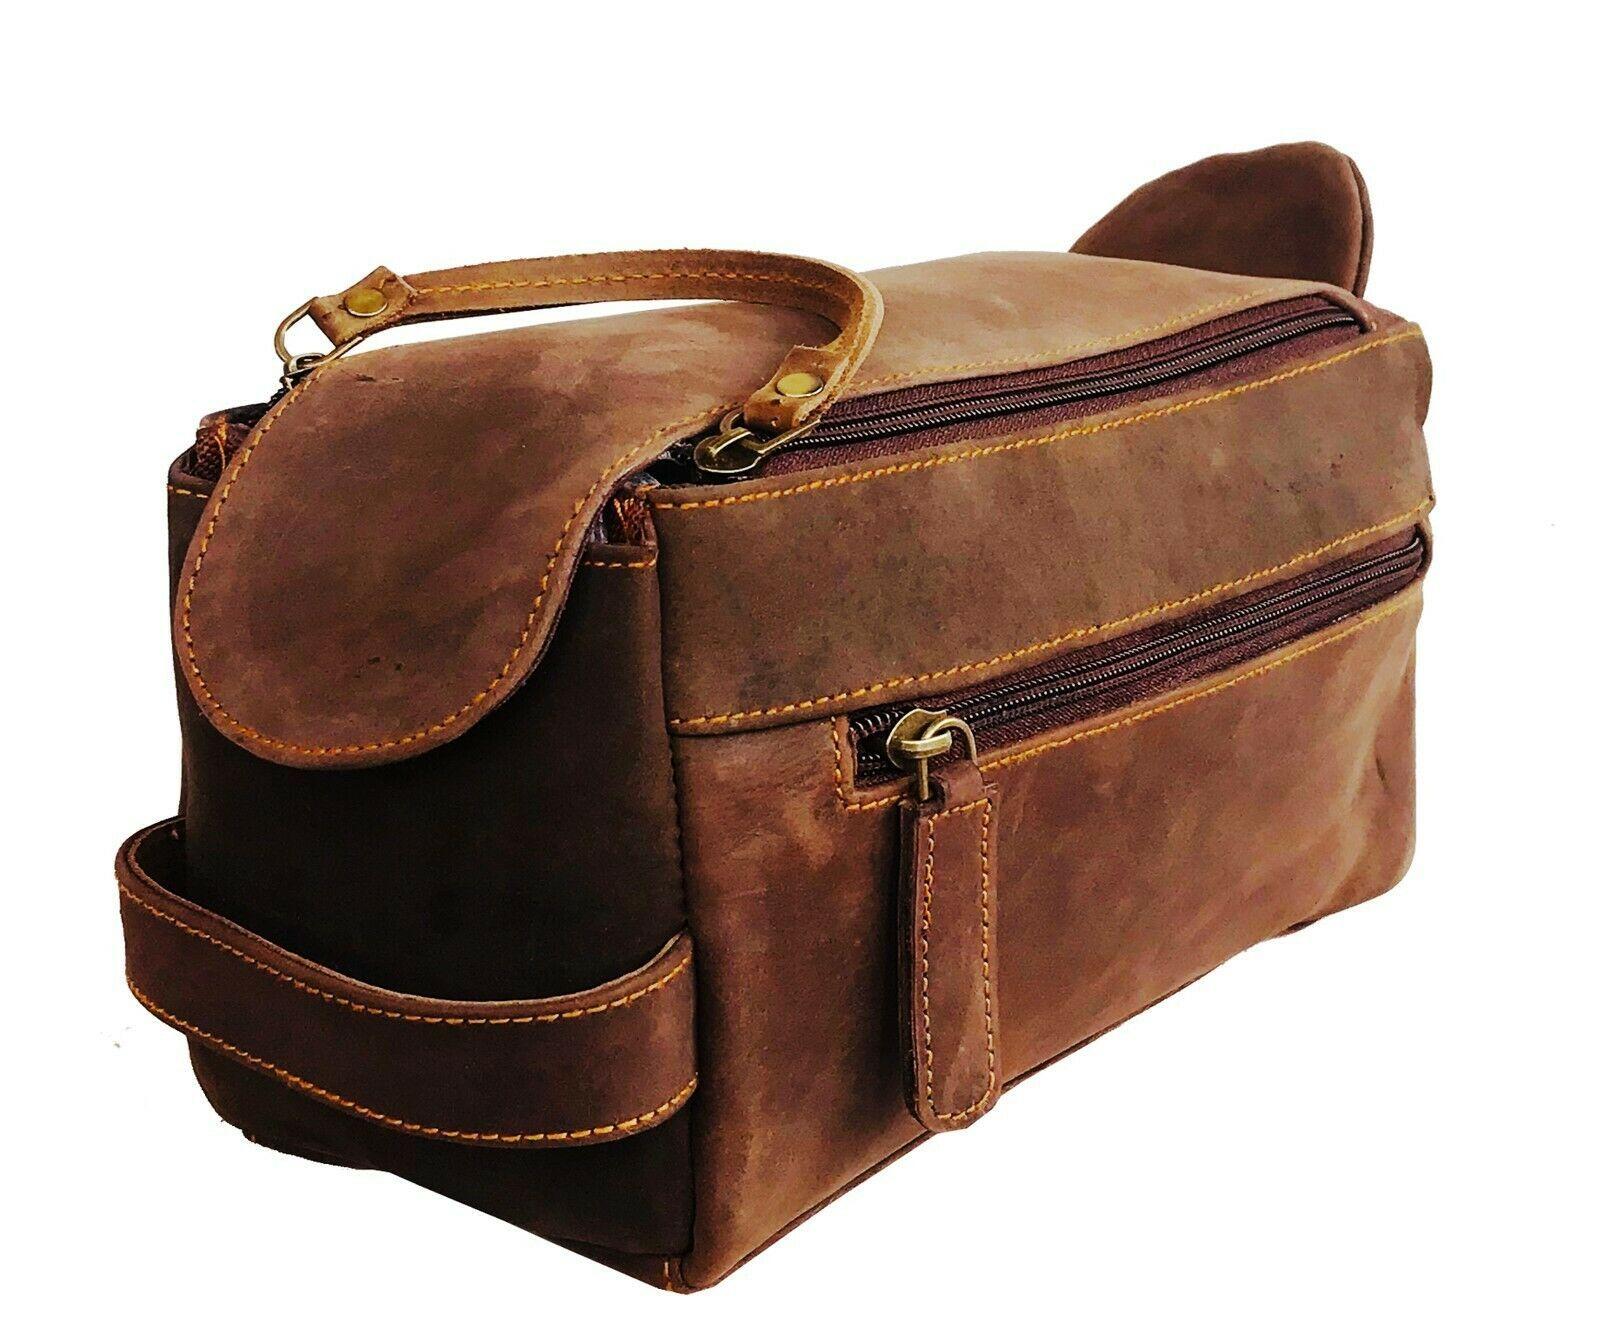 Leather Travel Kit Bag In 2020 Mens Travel Bag Leather Travel Kit Leather Cosmetic Pouch